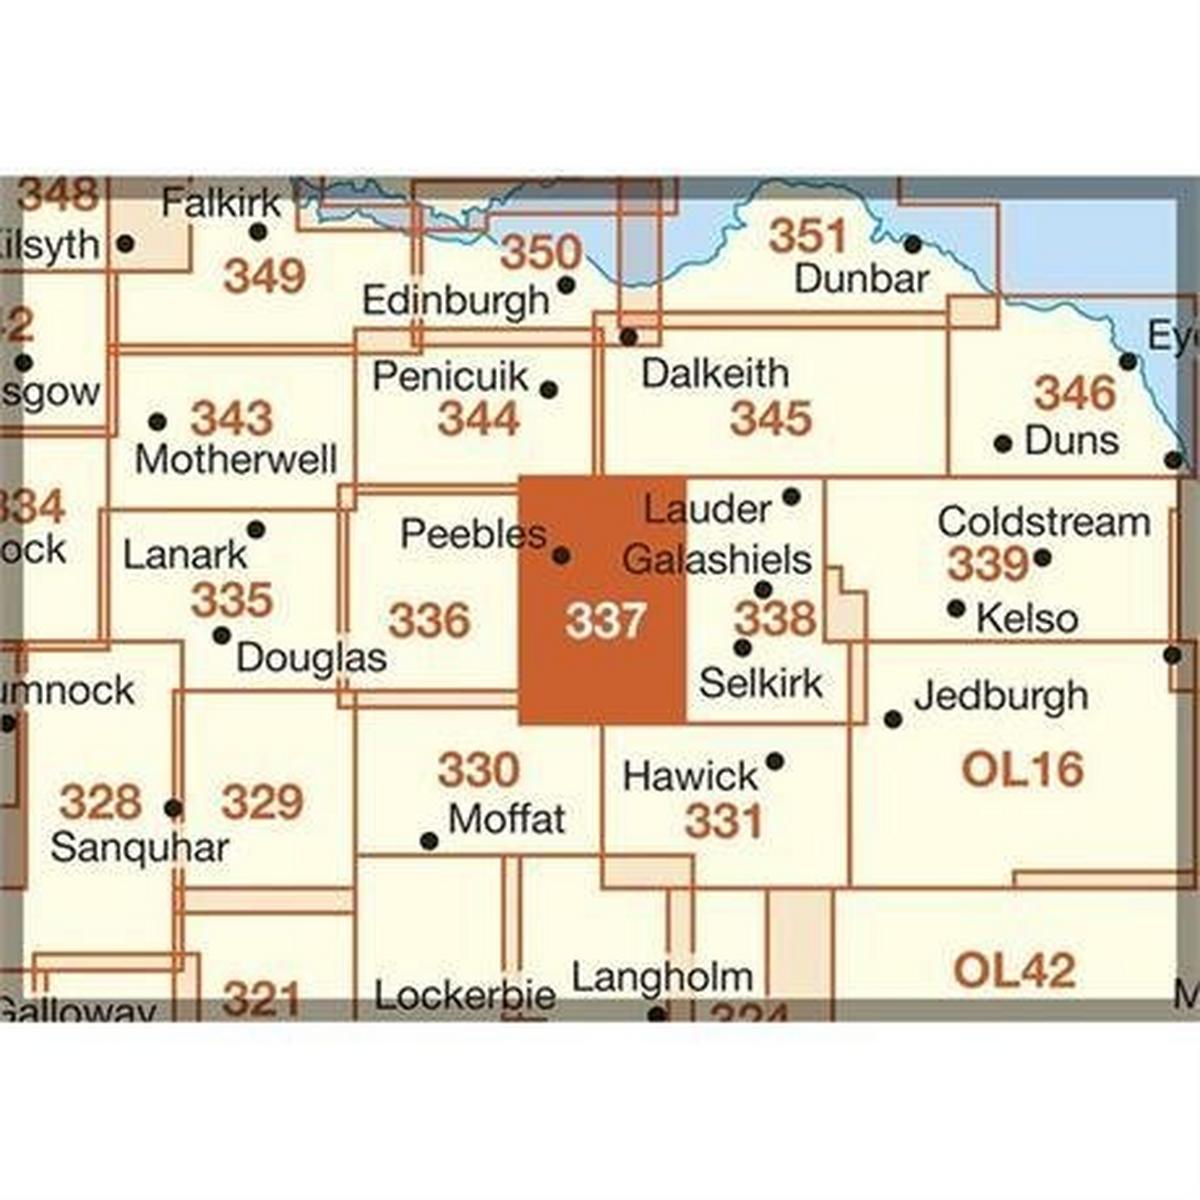 Ordnance Survey OS Explorer Map 337 Peebles and Innerleithen